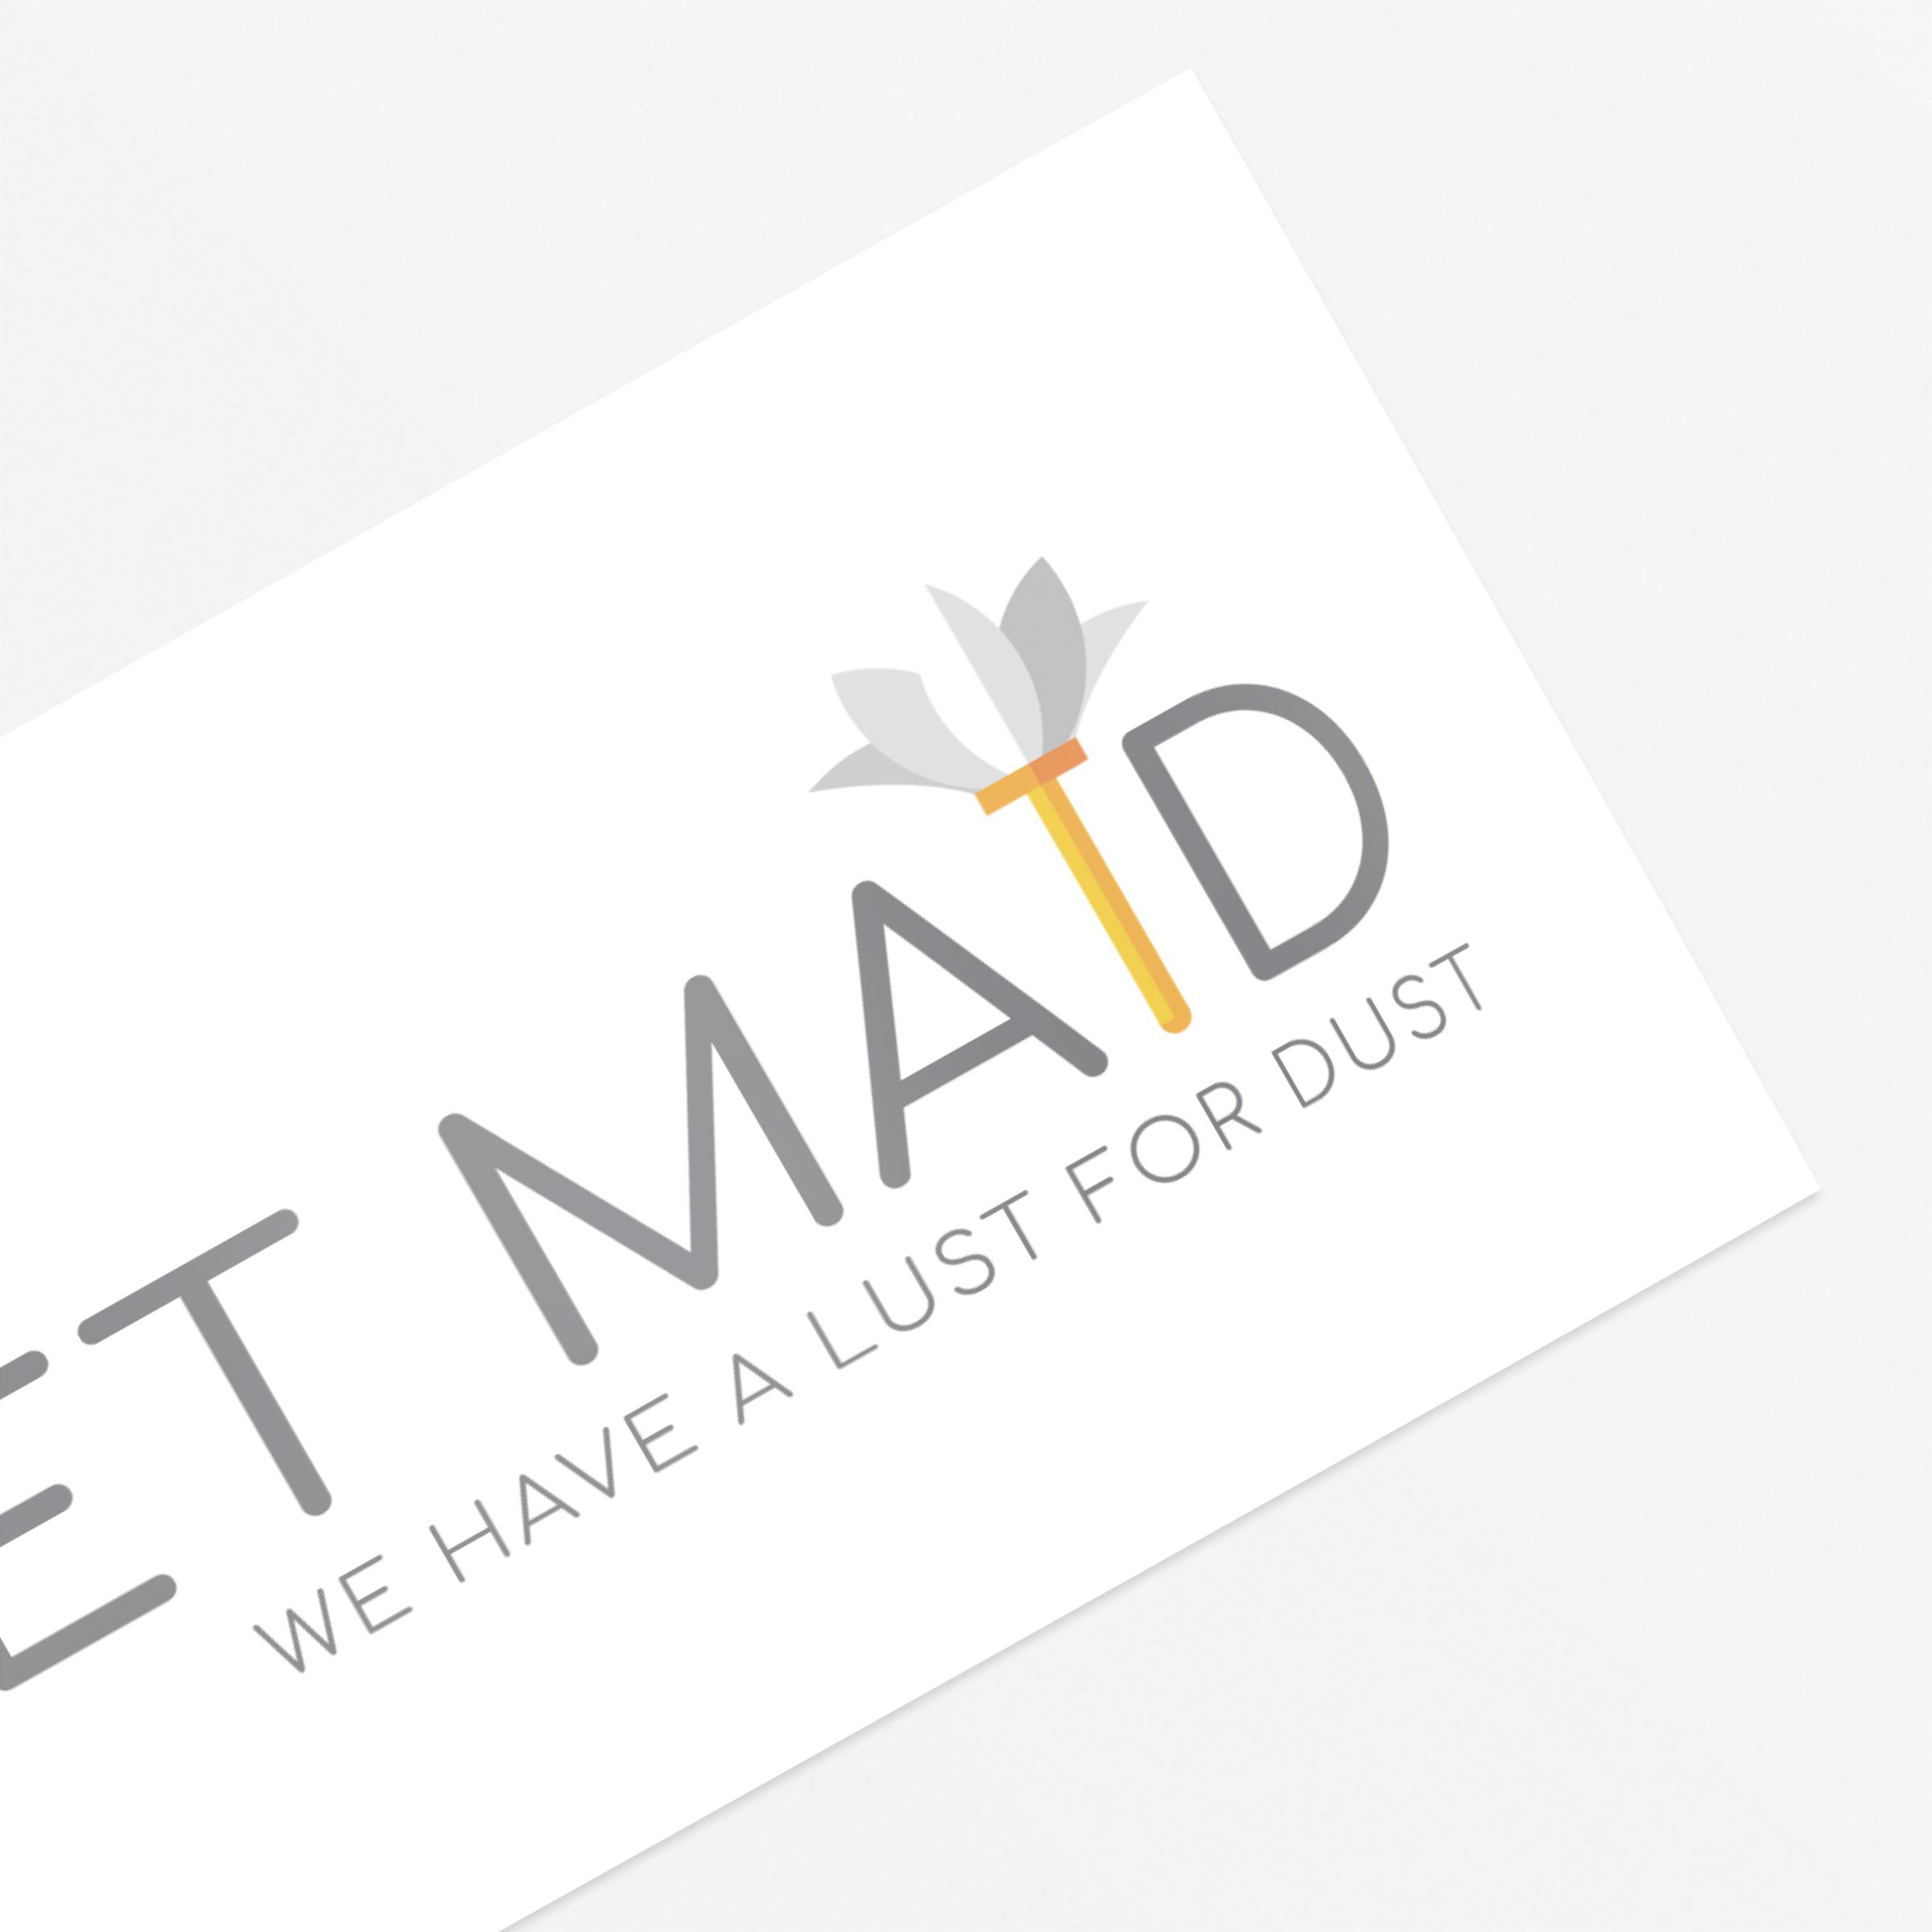 Get maid (3).jpg